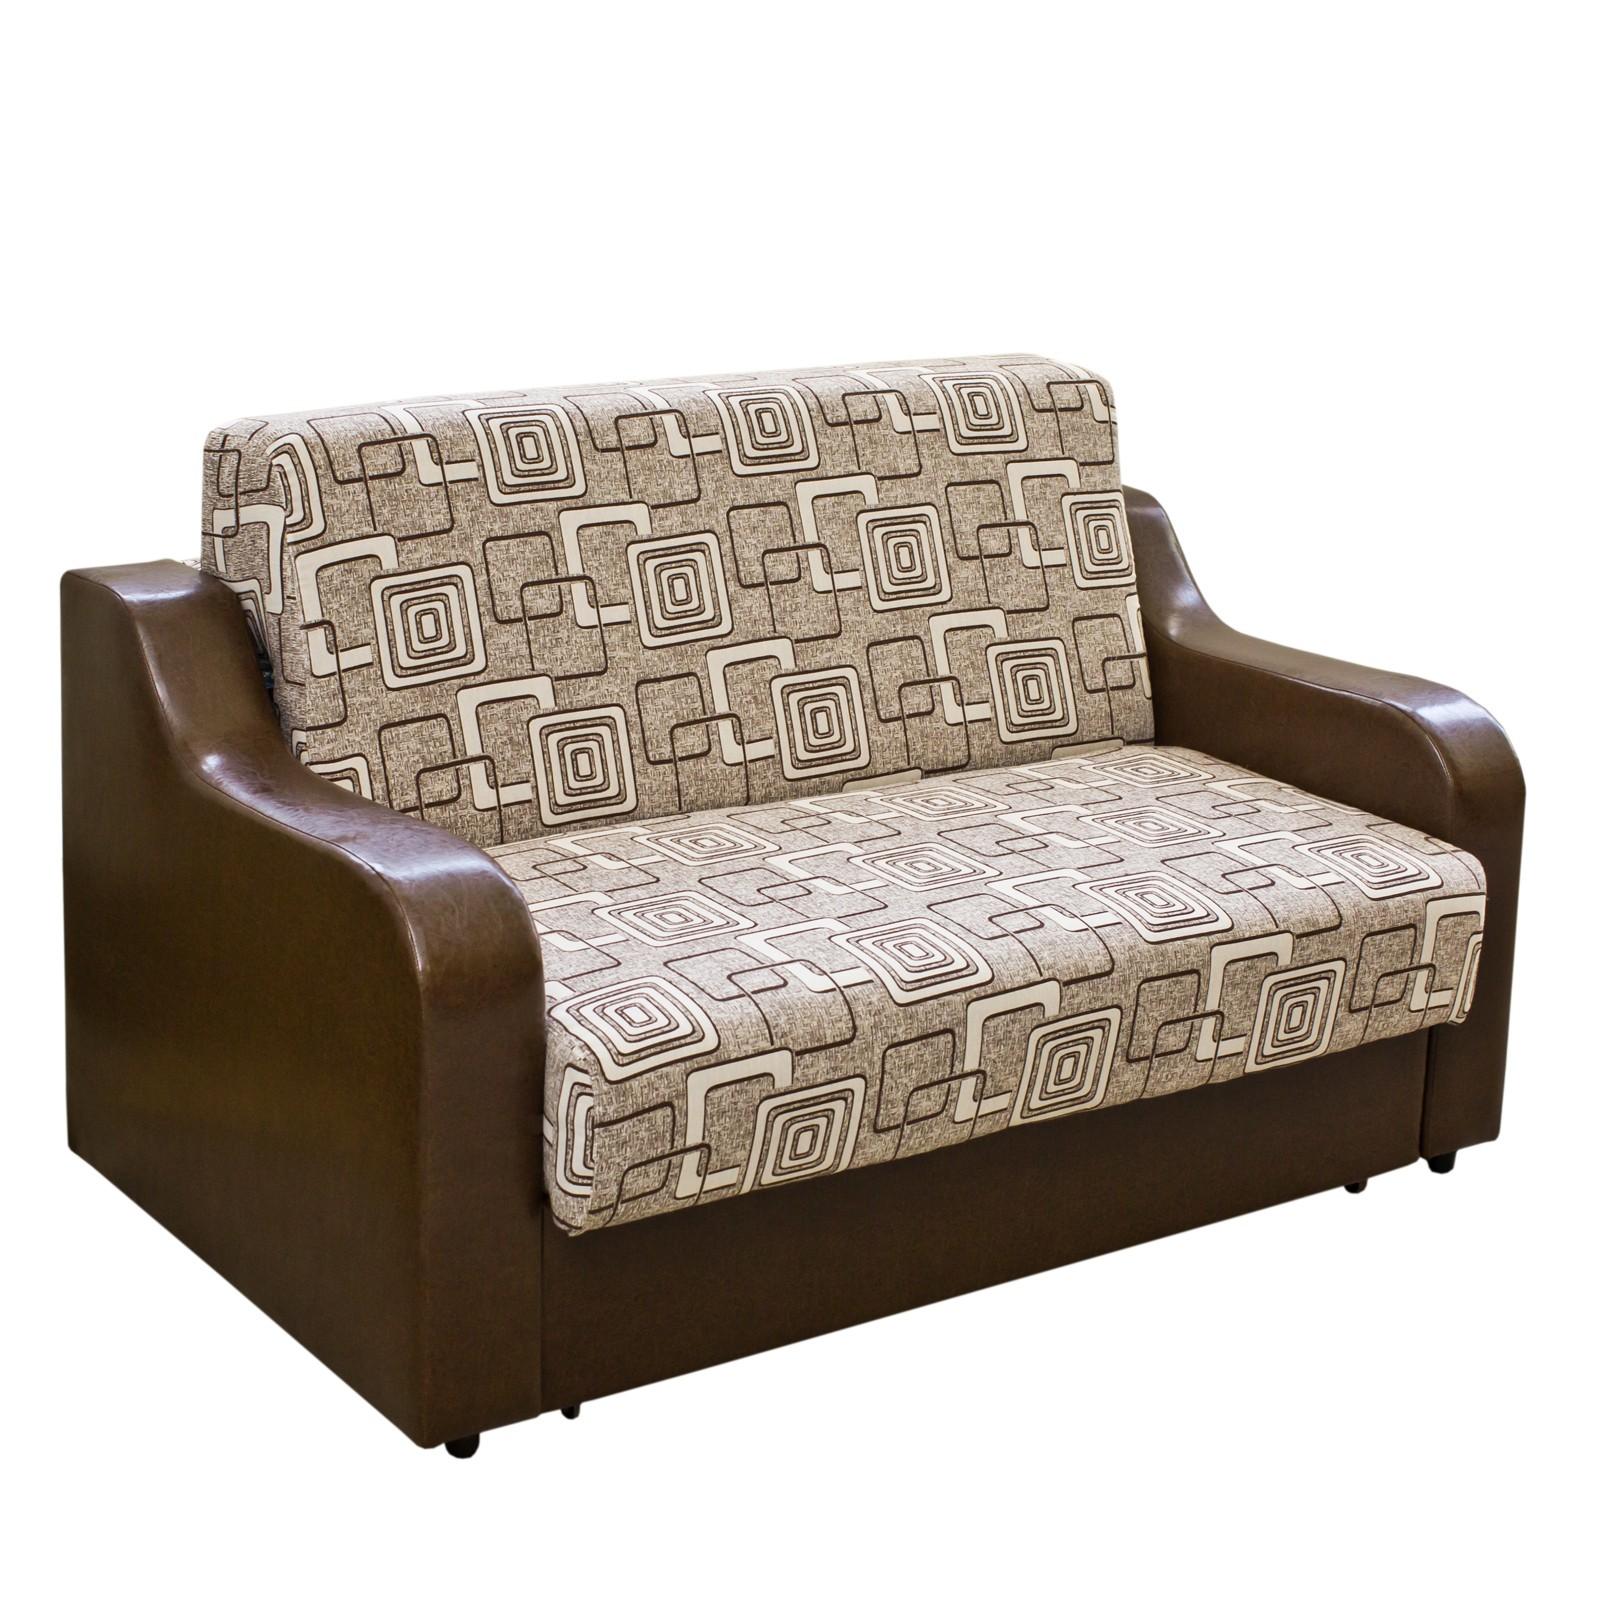 dedeman canapea extensibila 3 locuri galaxy cu lada diverse culori 97 x 155 x 95 cm 1c. Black Bedroom Furniture Sets. Home Design Ideas